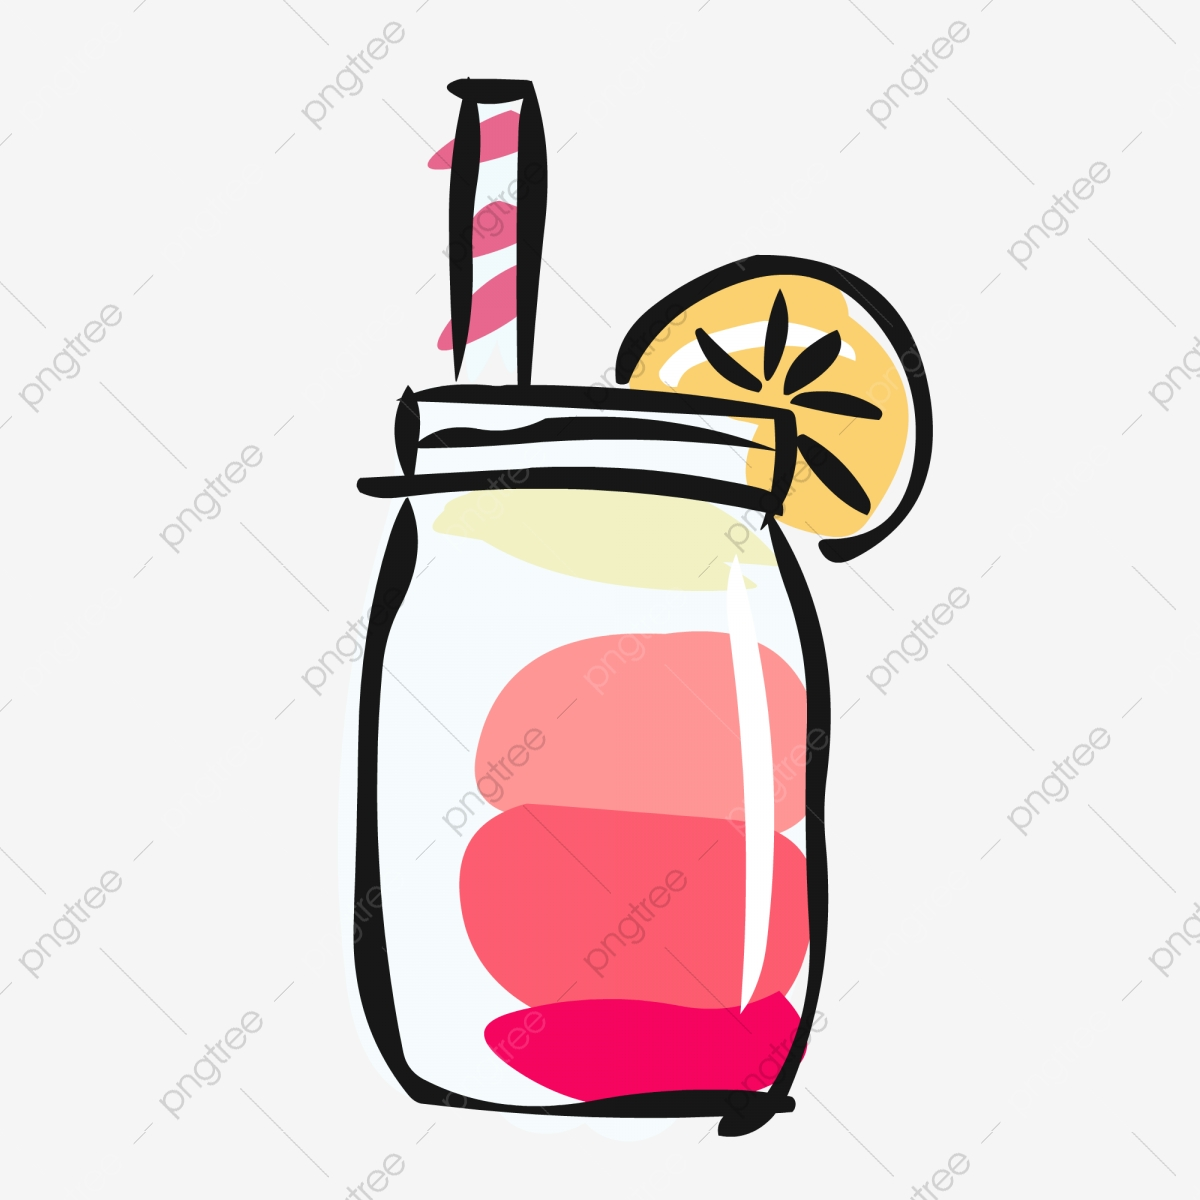 Elemen Makanan Tangan Disediakan Minuman Kartun Comel Elemen